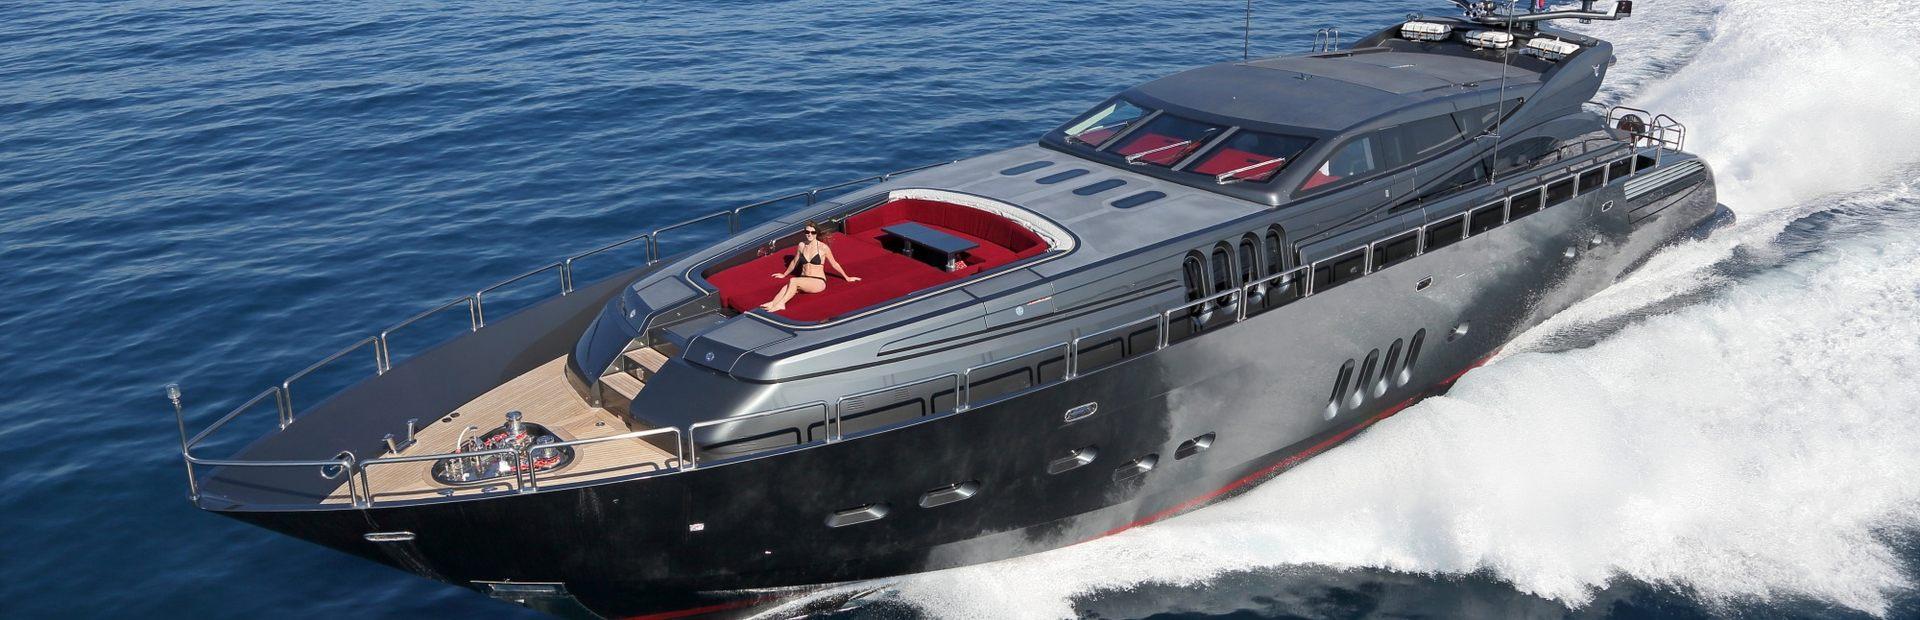 Leopard Yachts Profile Photo